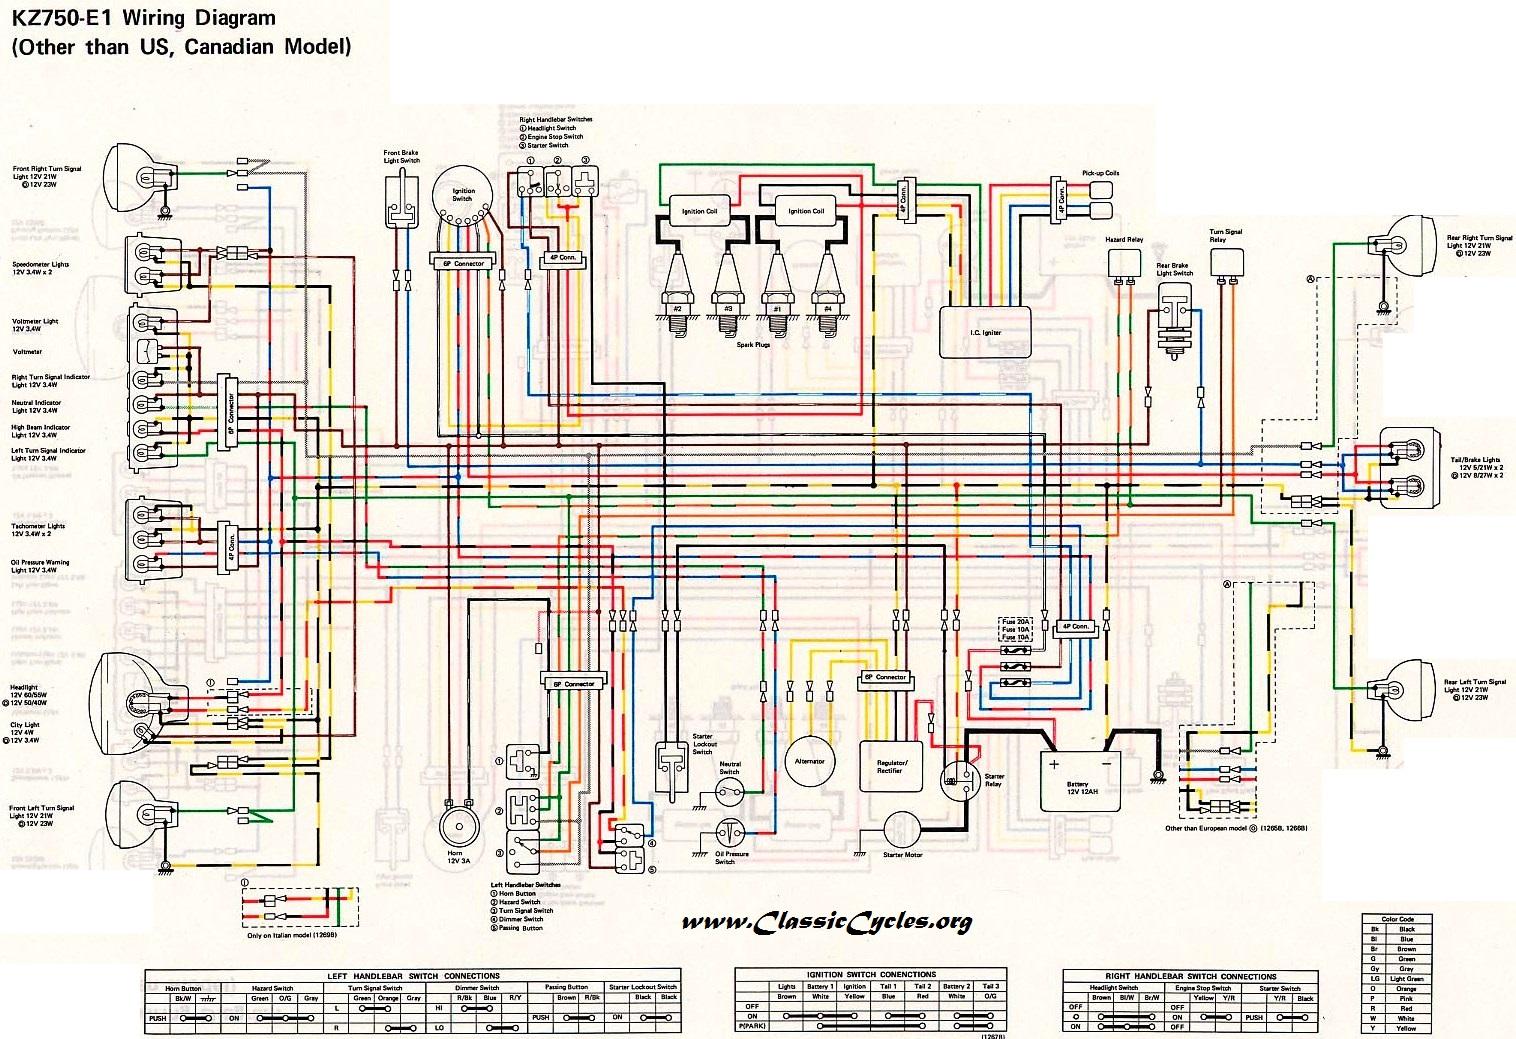 40841264b60c8a9fffff84f7ffffe41e?resize\=665%2C456 2008 klr 650 wiring diagram wiring diagram simonand 2007 klr 650 wiring diagram at edmiracle.co